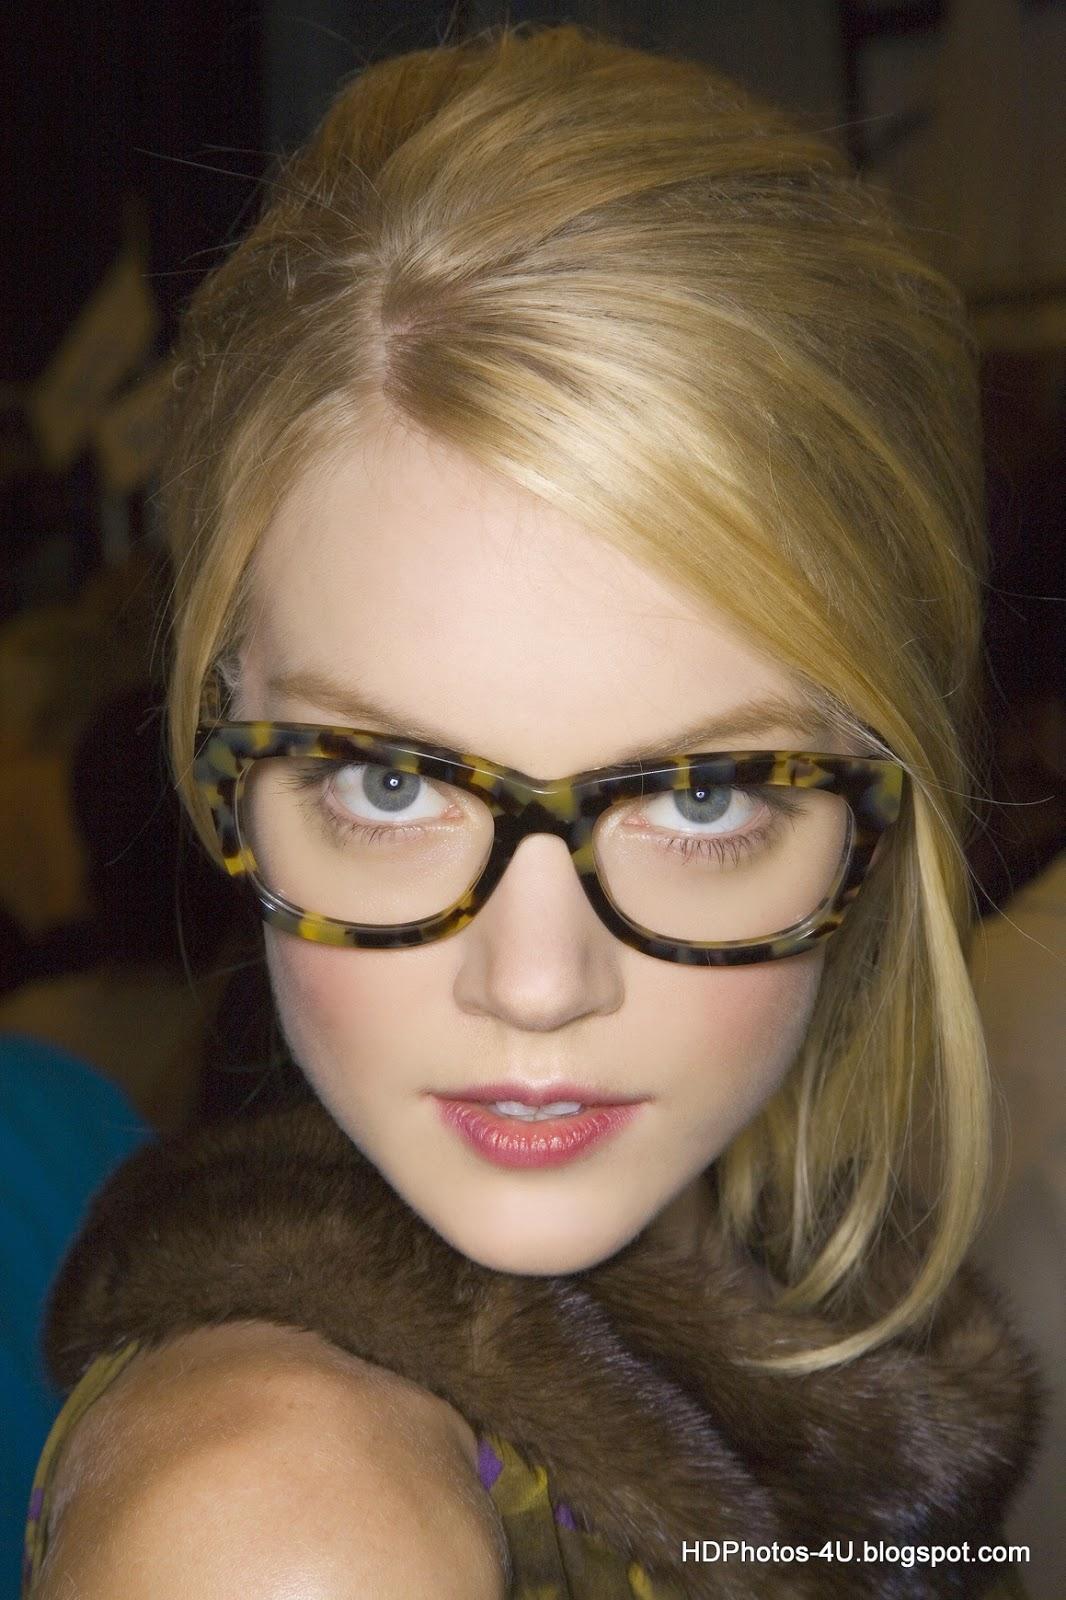 Australian Actress Lindsay Ellingson Hd Images Wallpapers Hd Photos